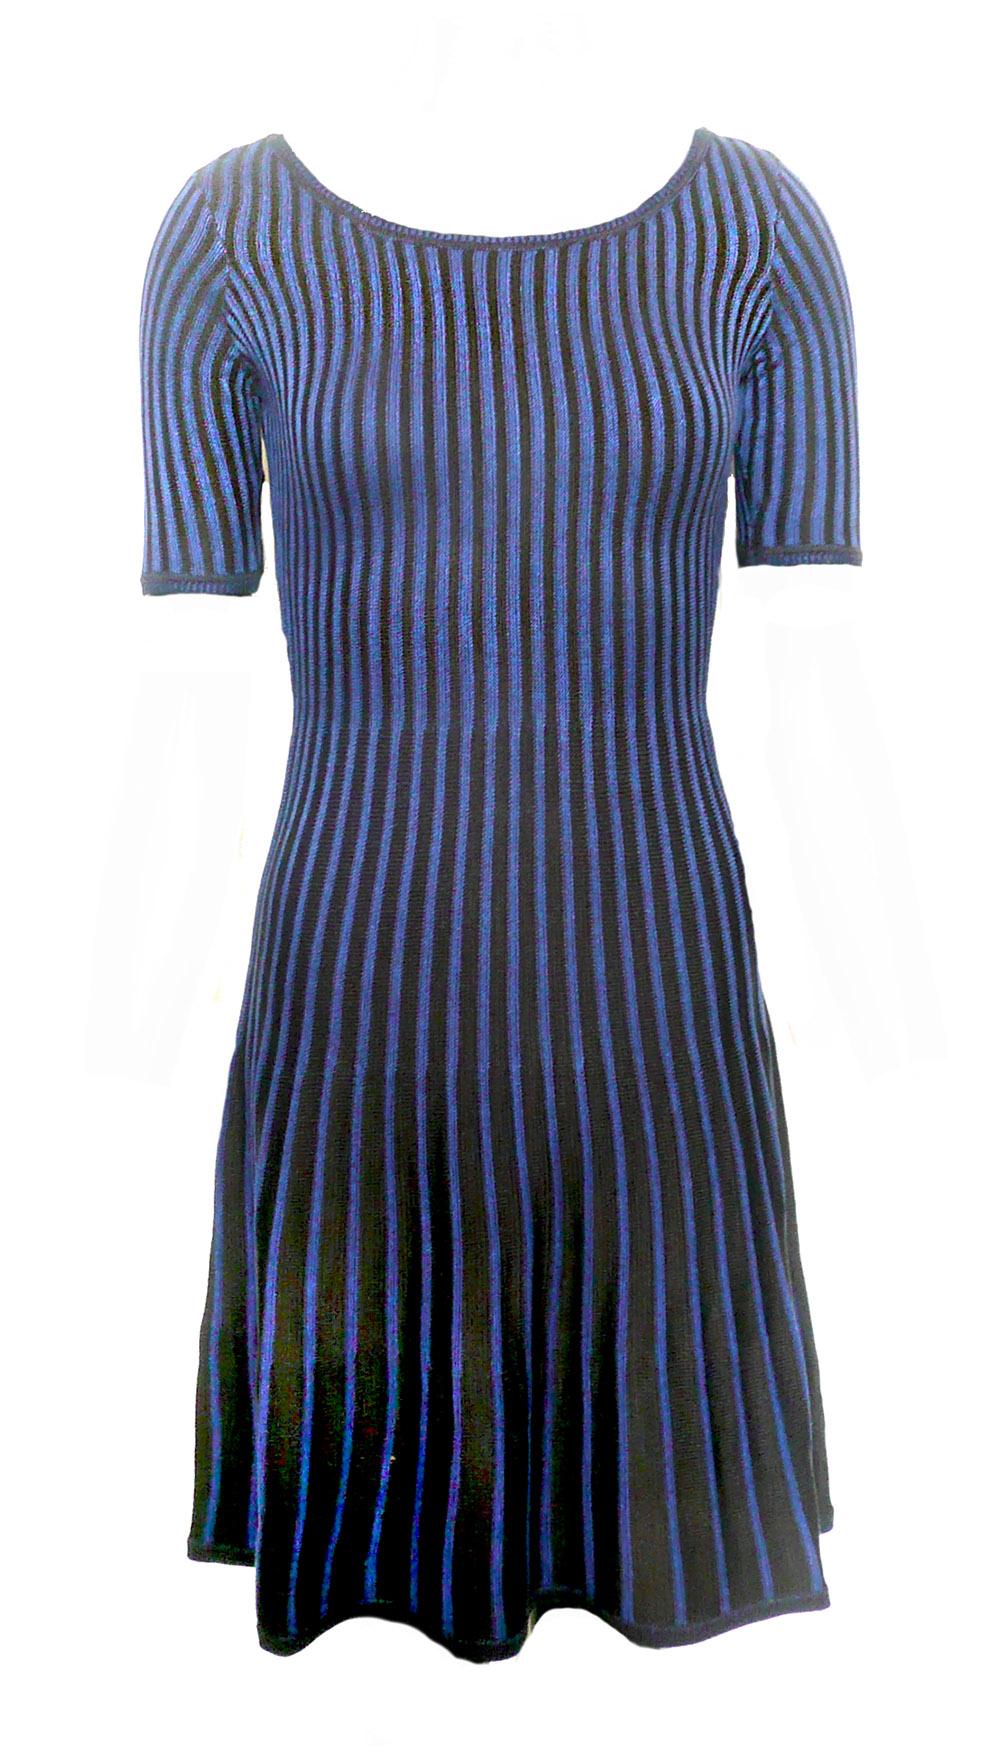 dress marc ny roy stripe.jpg